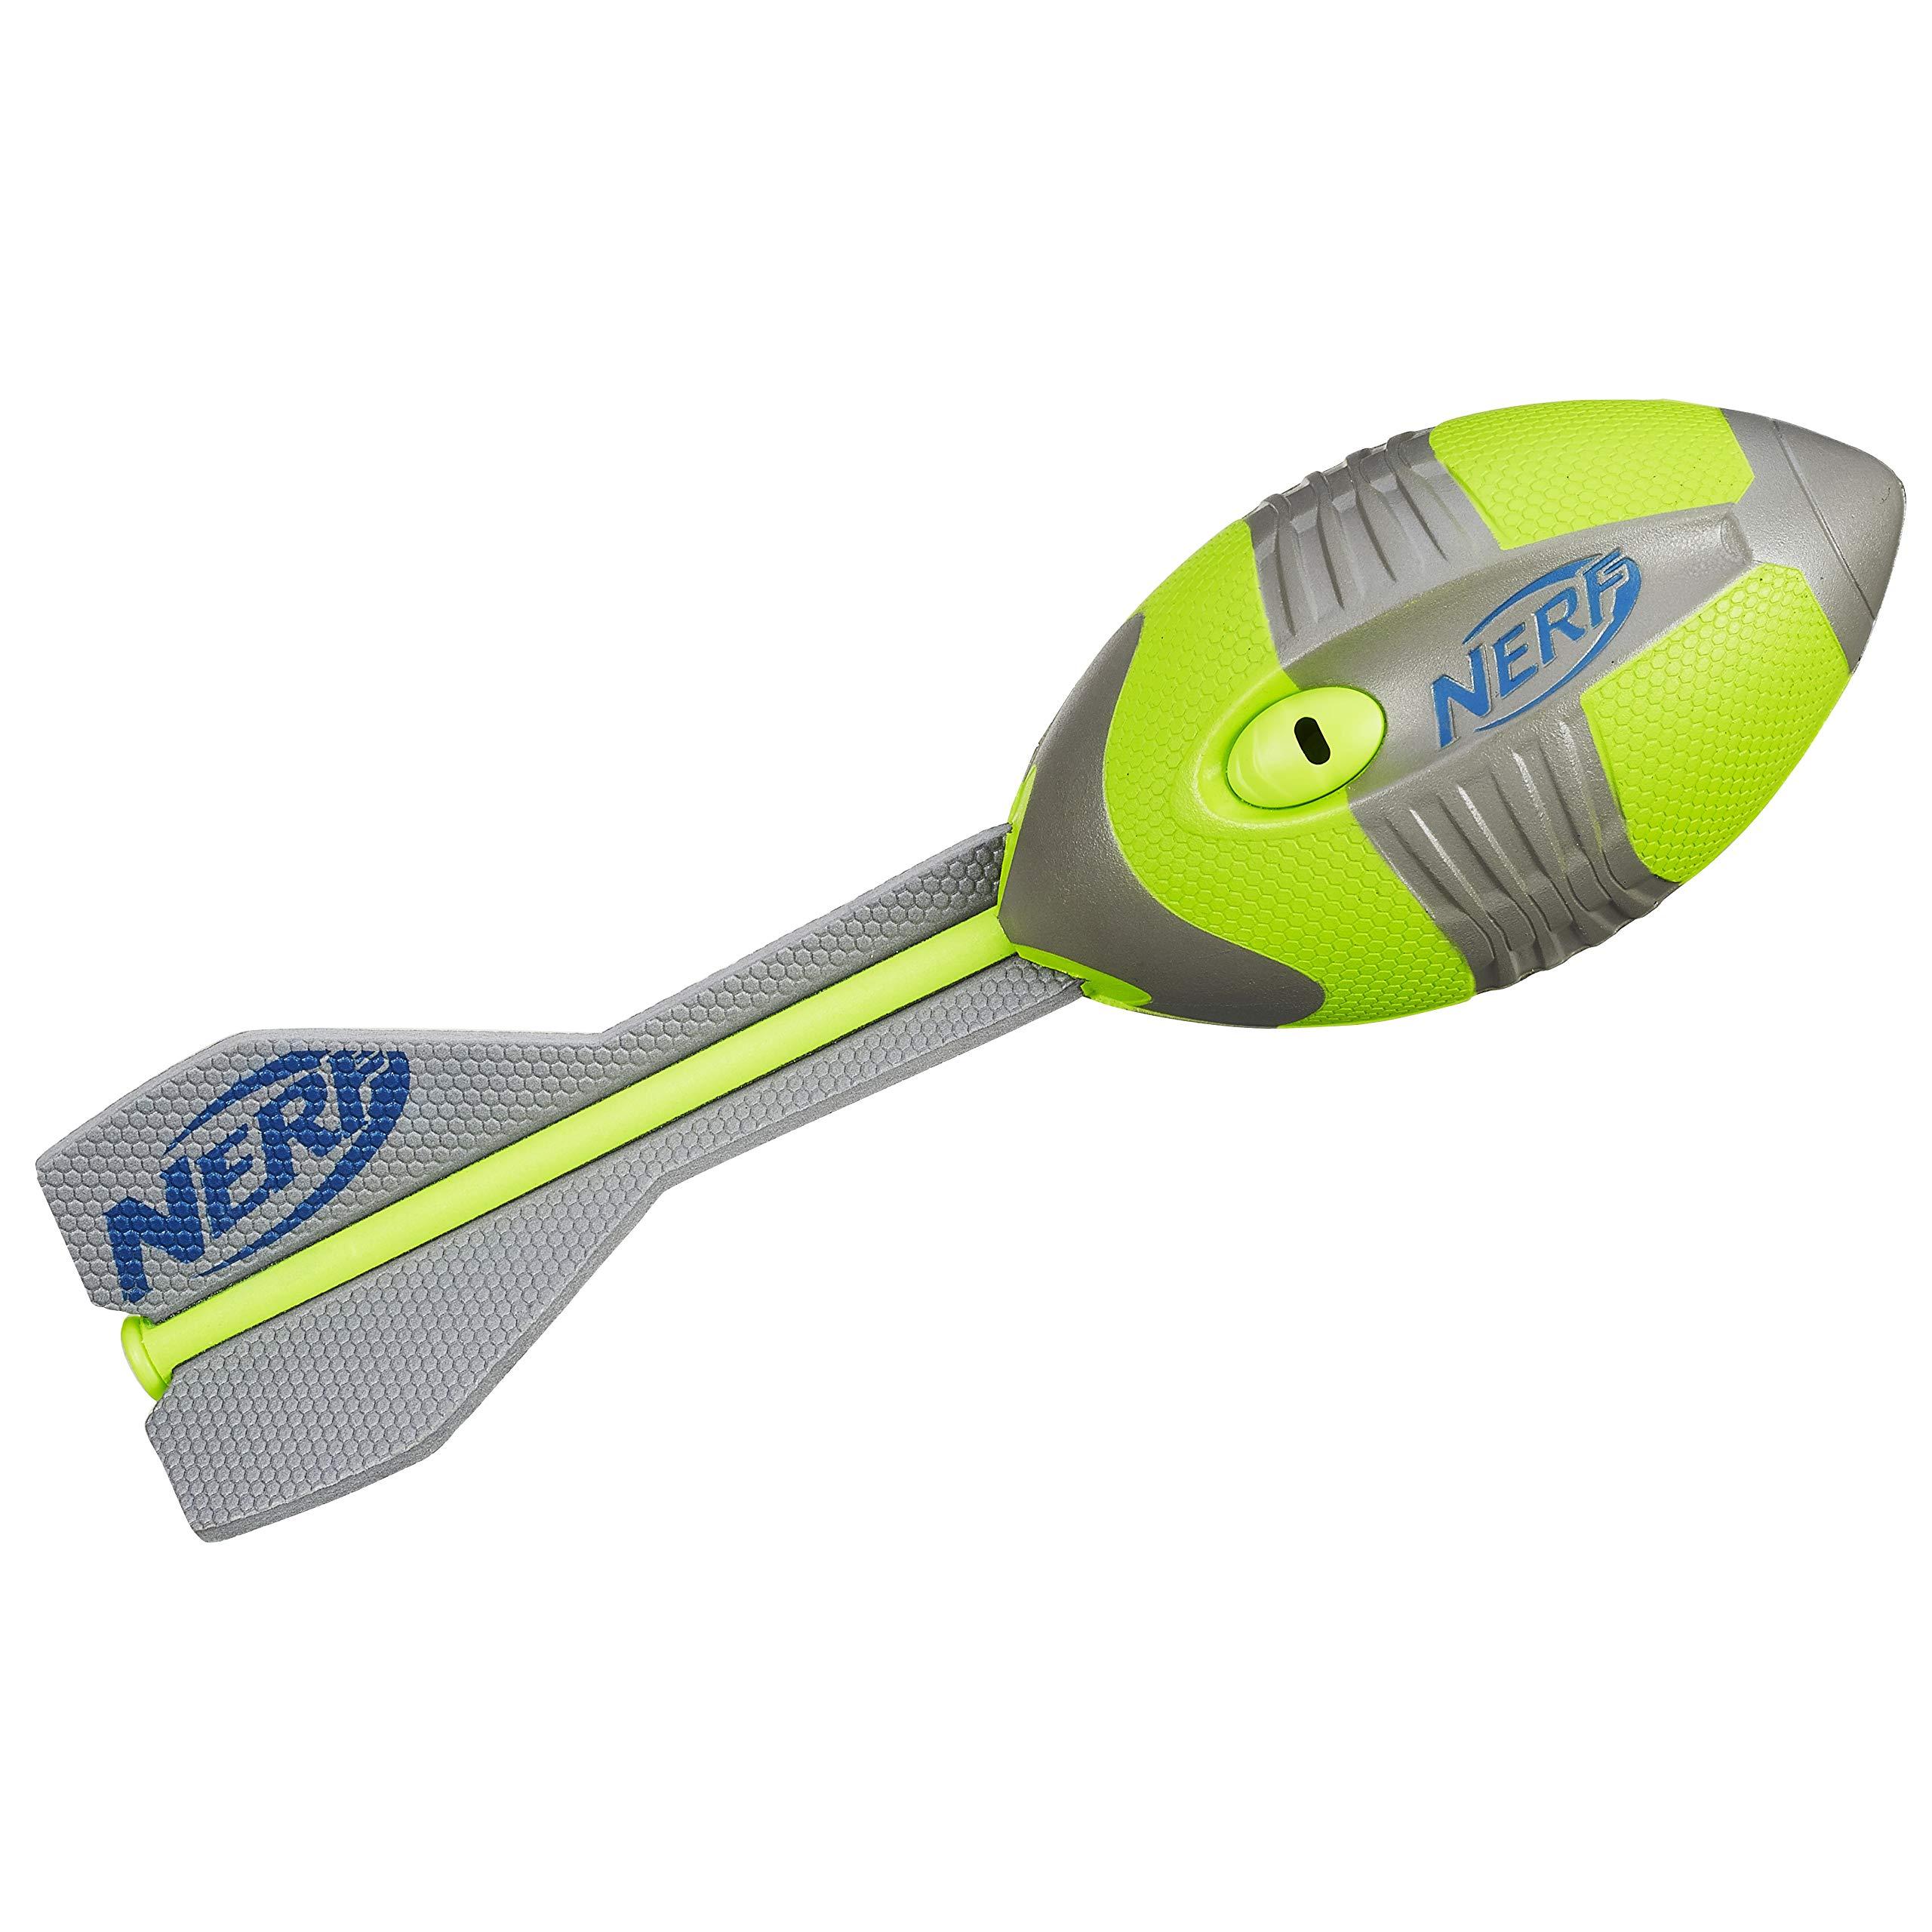 Nerf A0364AS21 Vortex Football, 3-1/2 x 12'', Grade: Kindergarten to 12, Assorted by Nerf